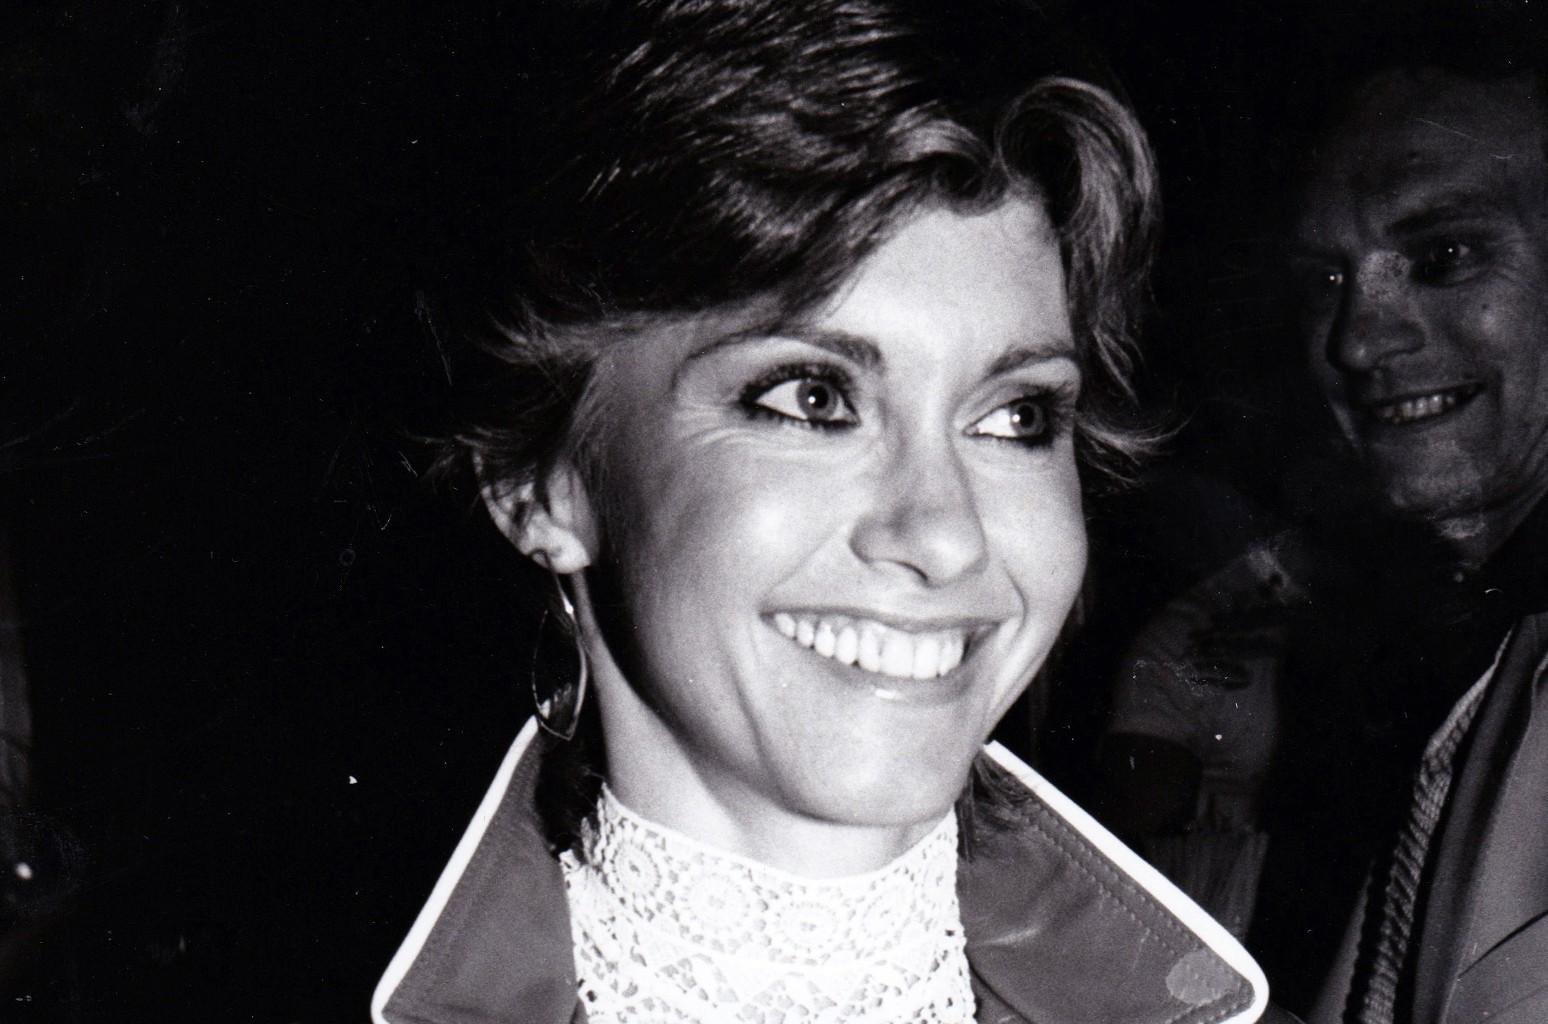 Olivia Newton John circa 1981 in New York.